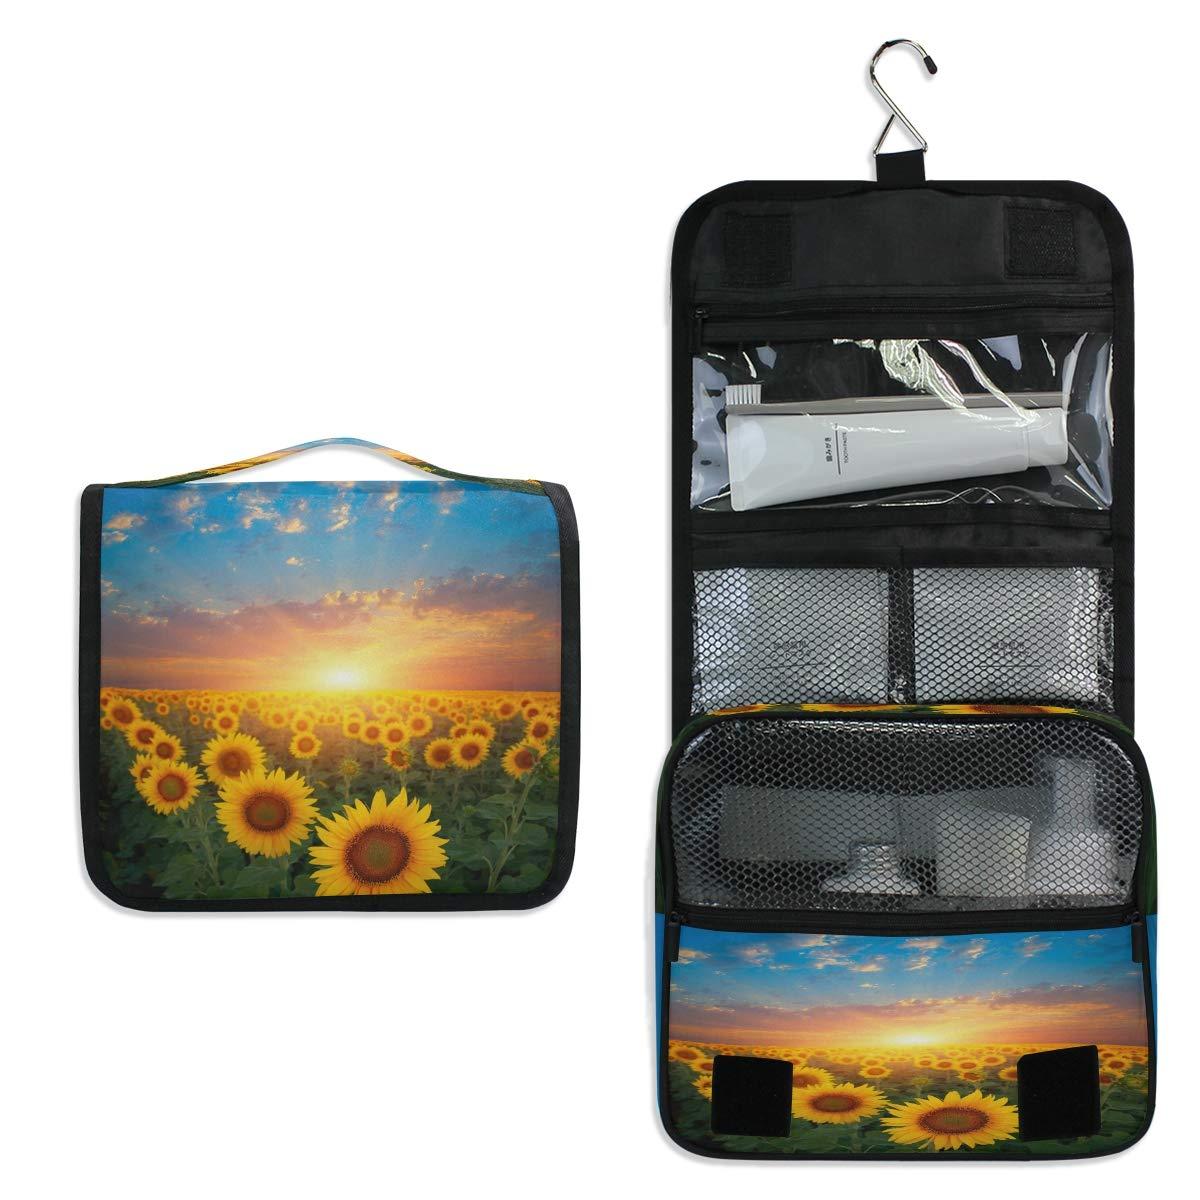 CCDMJ Hanging Toiletry Bag Sunset Sunflower Garden Floral Cosmetics Makeup Bags with Hook Portable Multifunction Travel bag Wash Bathroom Organizer for Women Girls